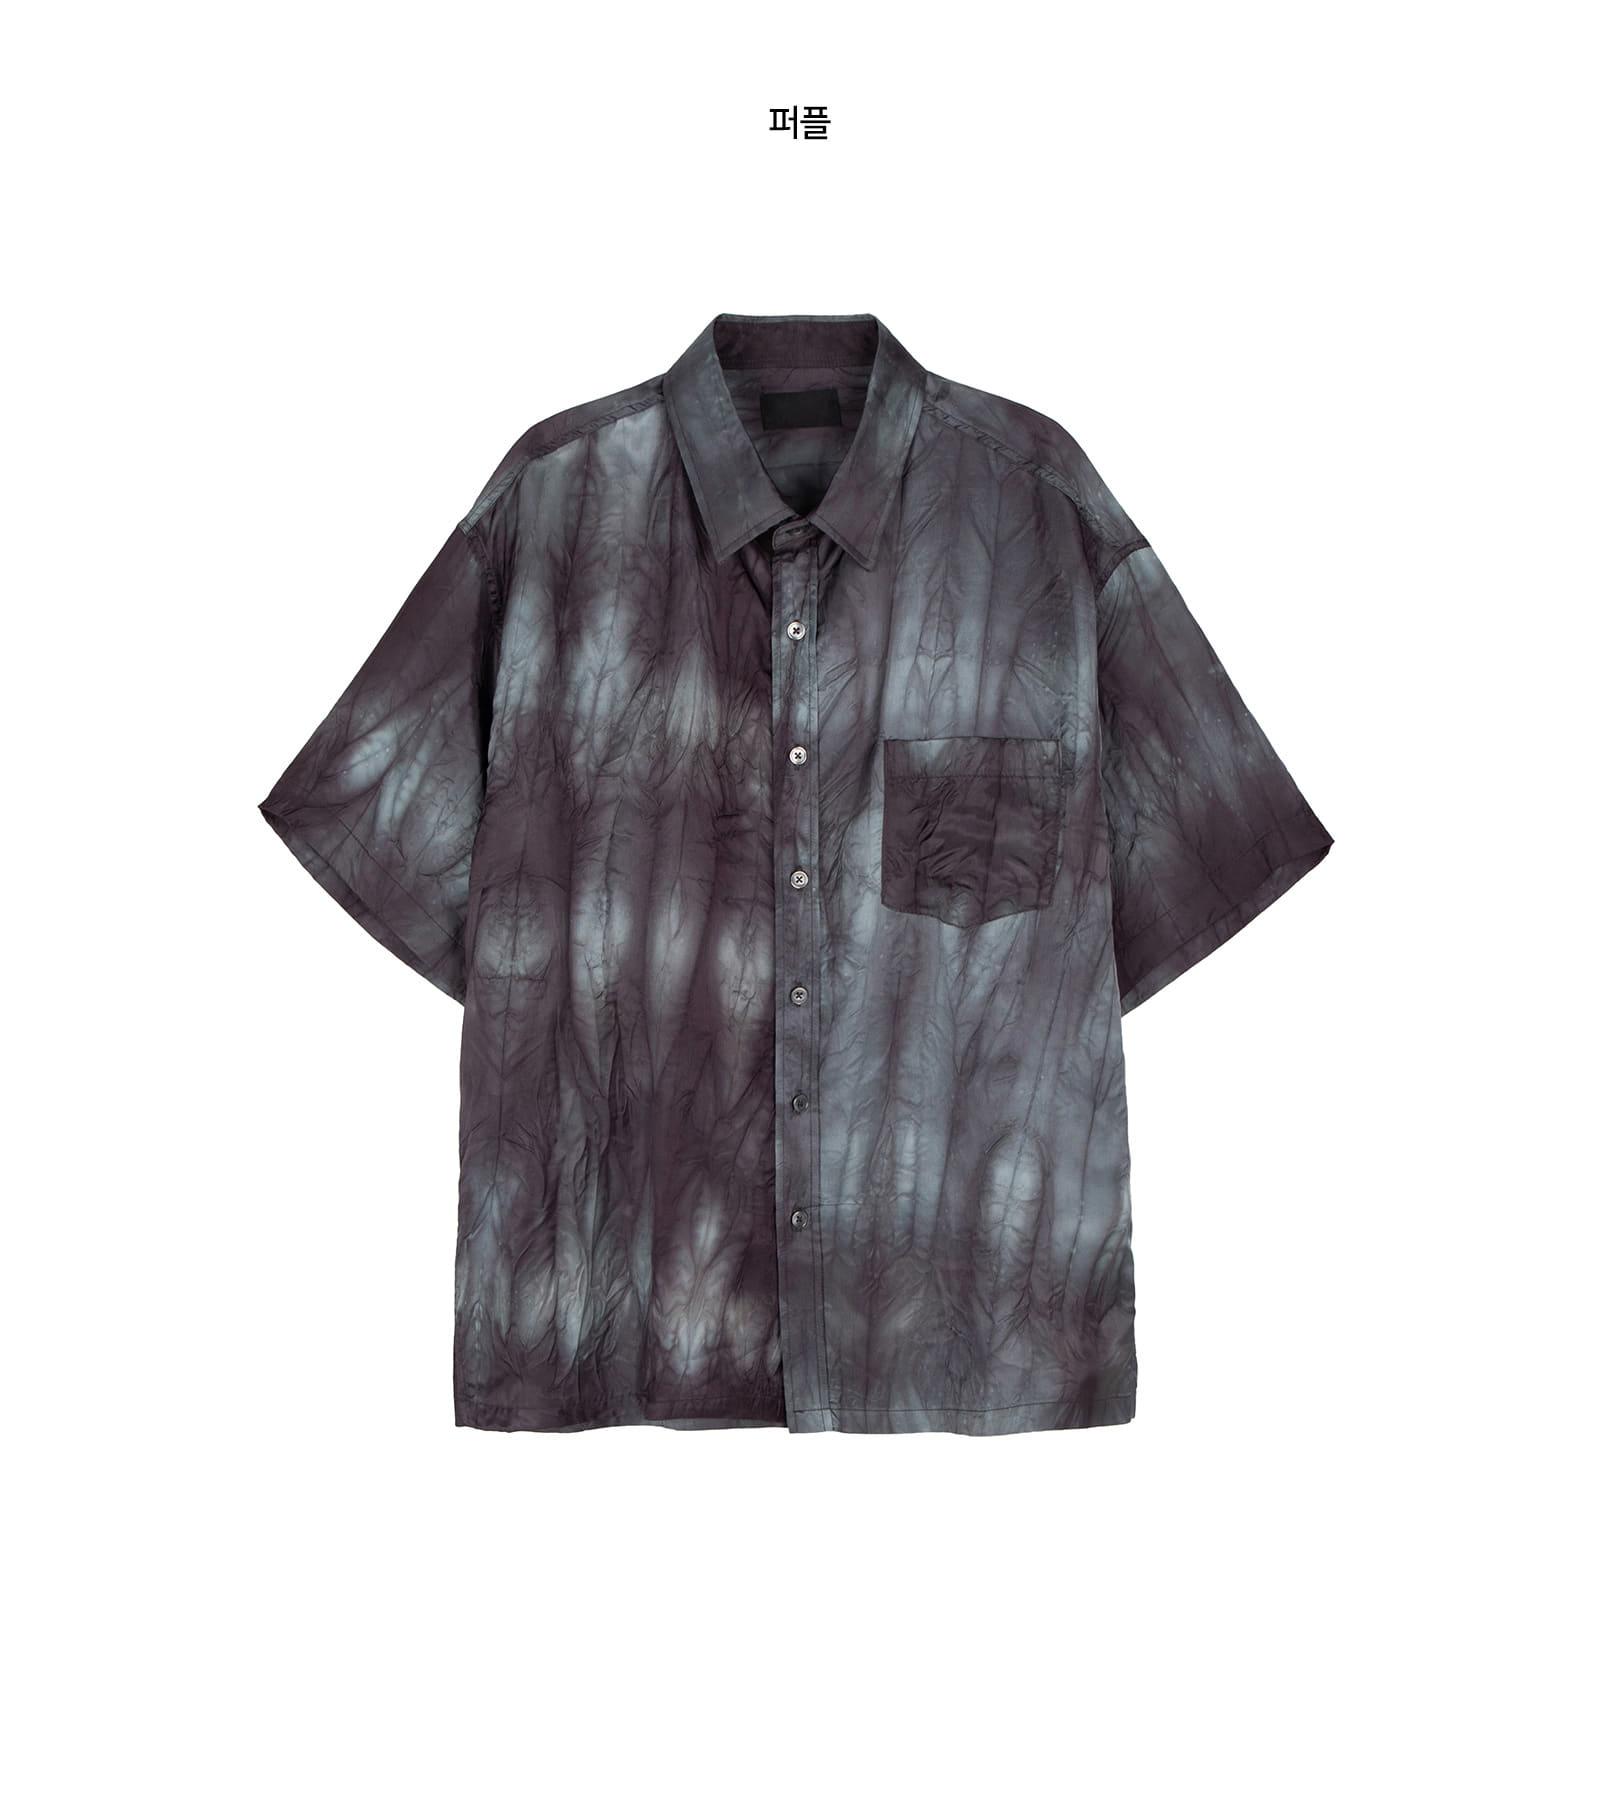 Unisex smog half shirt